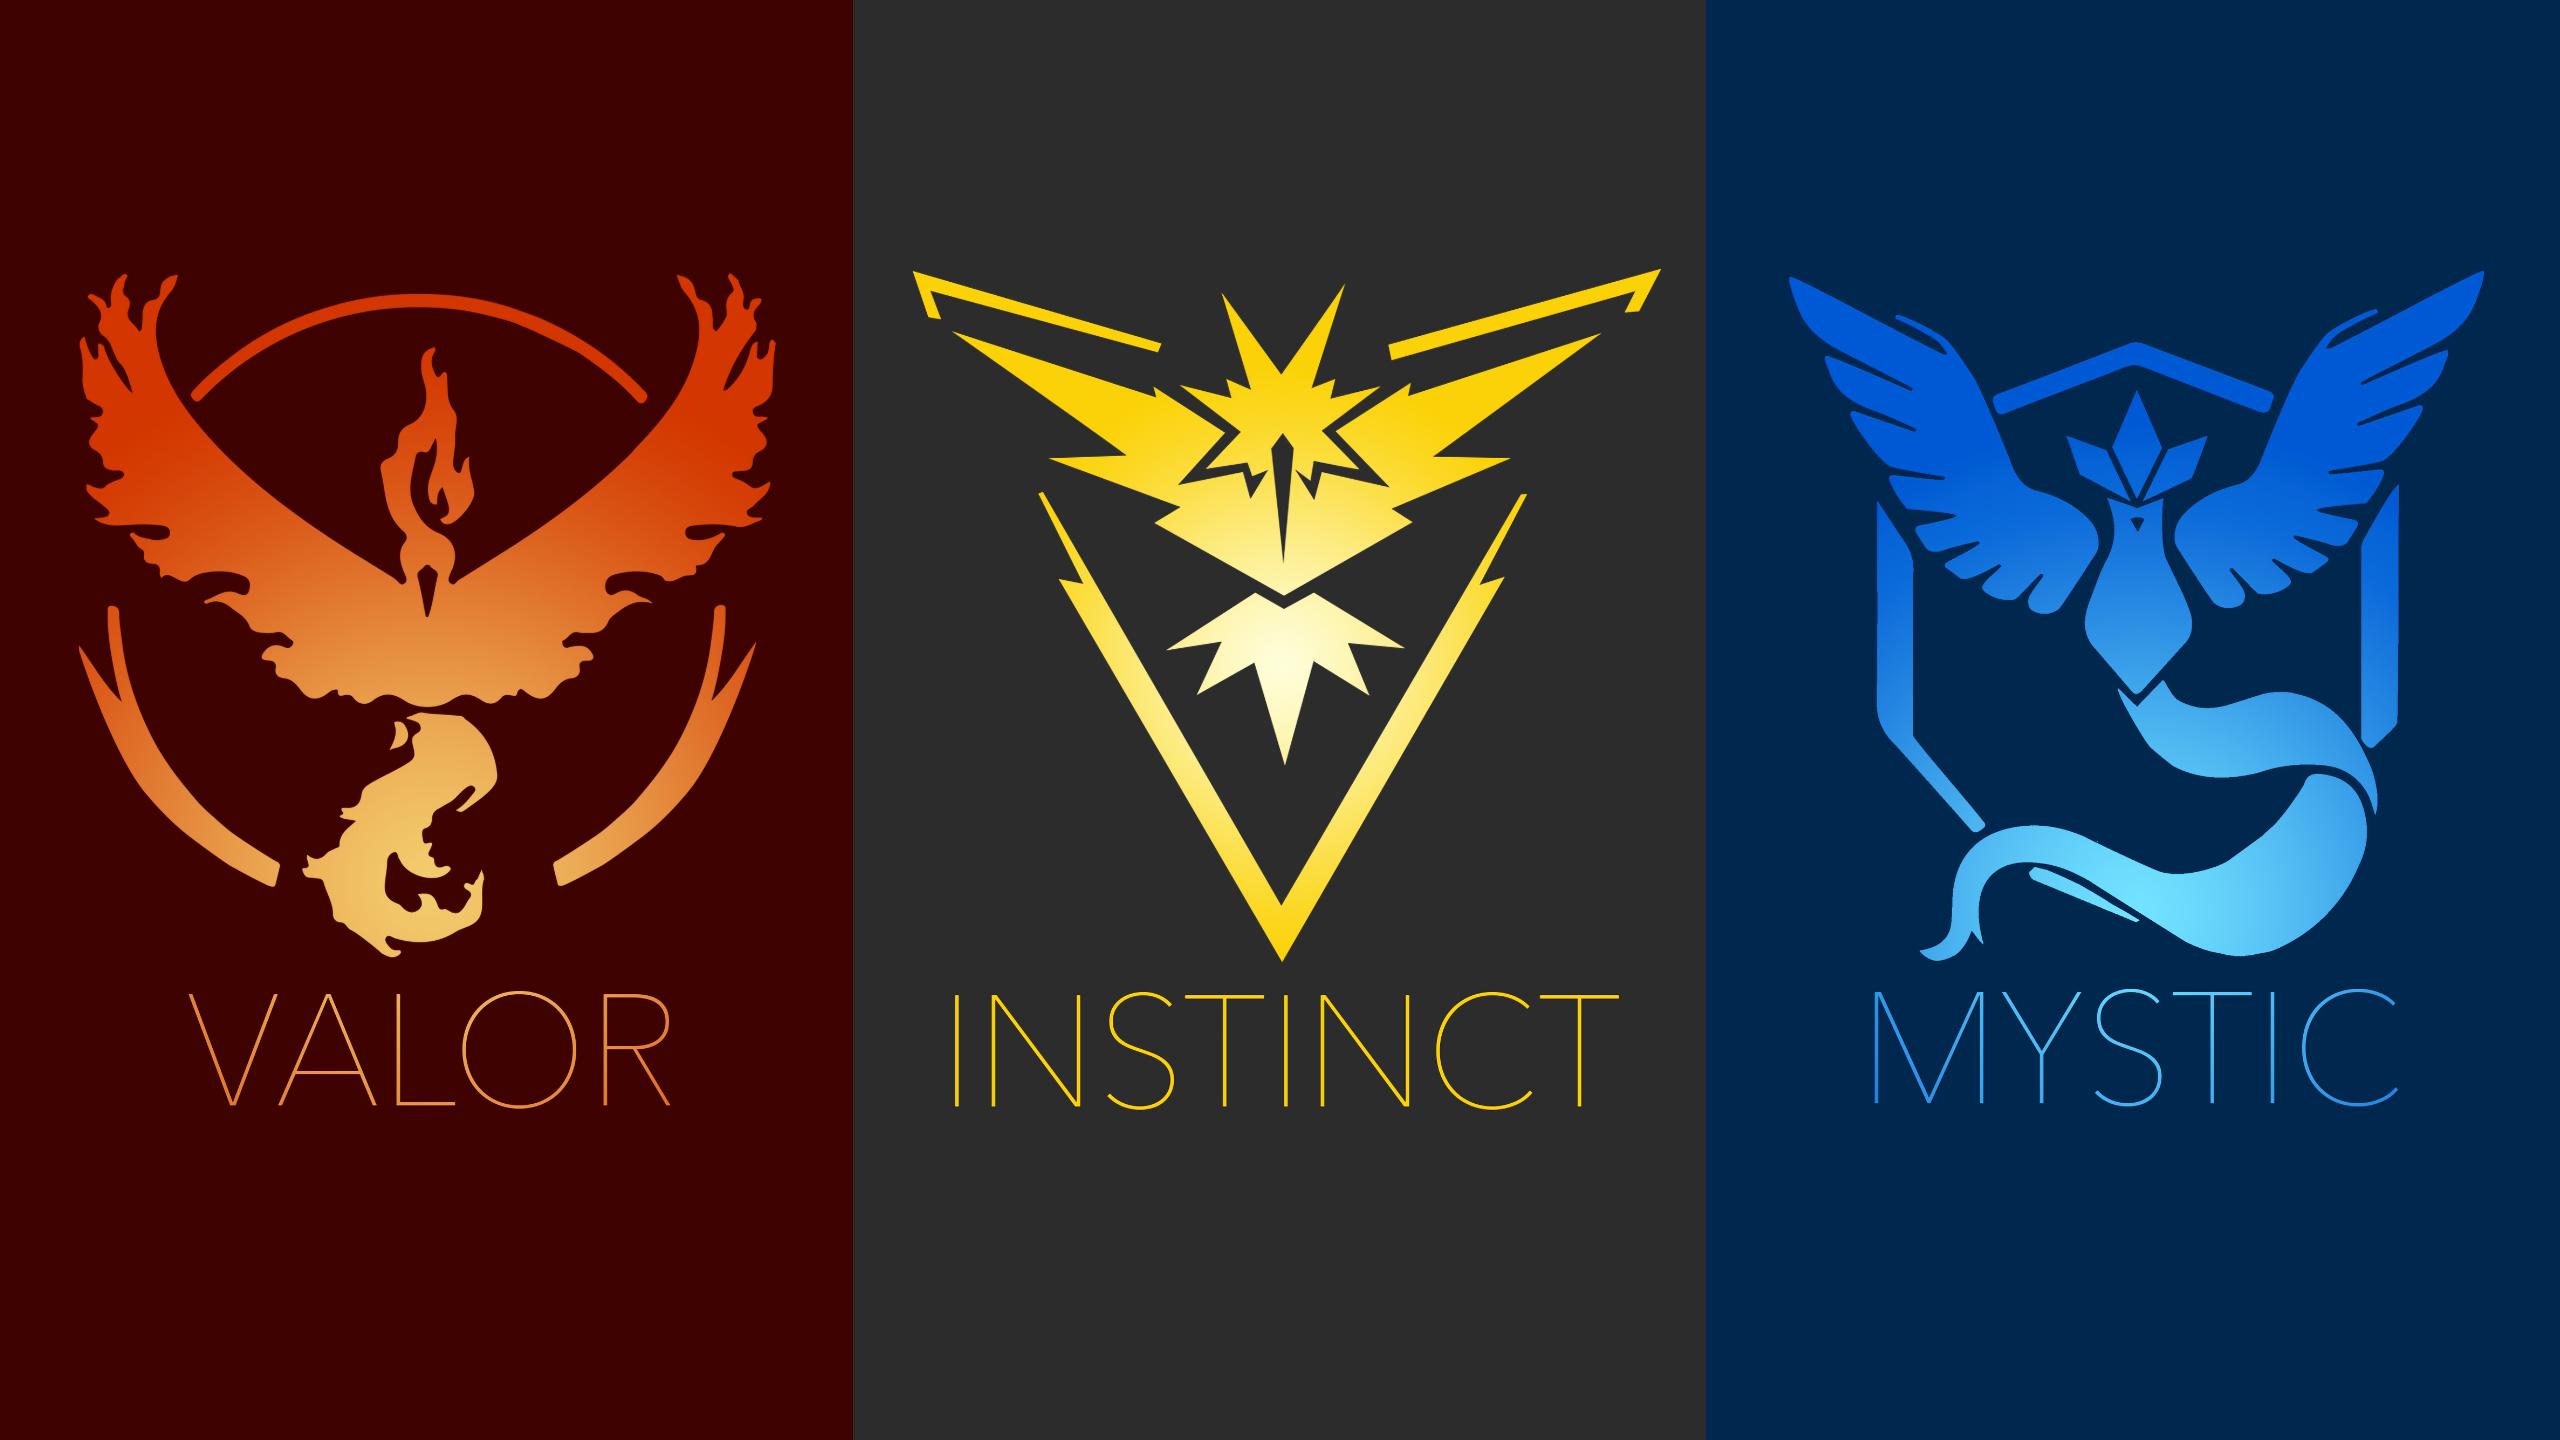 Teams Pokemon Go Vm Mystic Valor Y Instinct Pokemon Team Alle Pokemon Pokemon Go